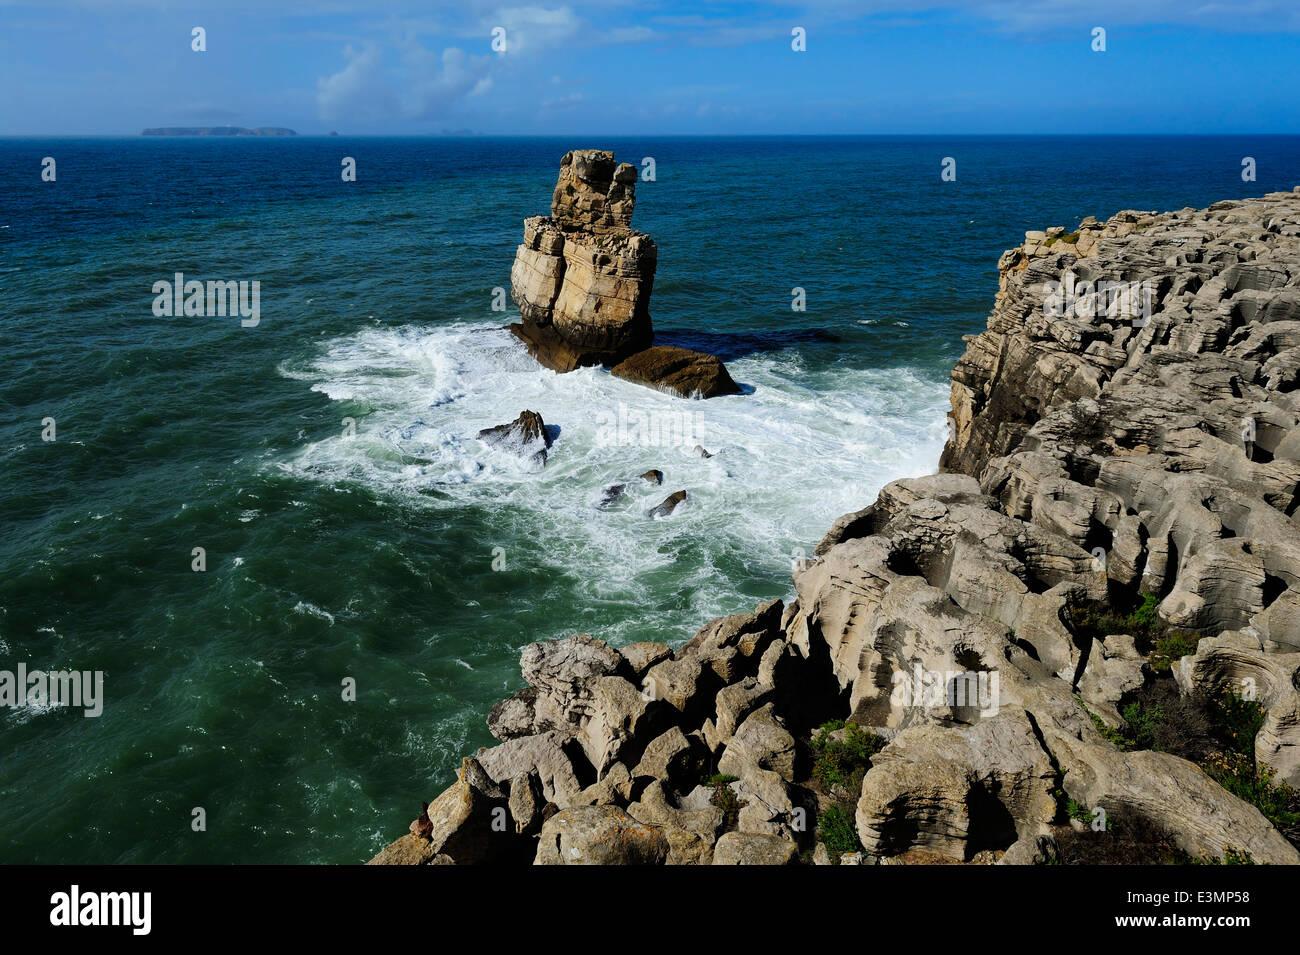 coast of the Atlantic ocean, Peniche, Portugal - Stock Image